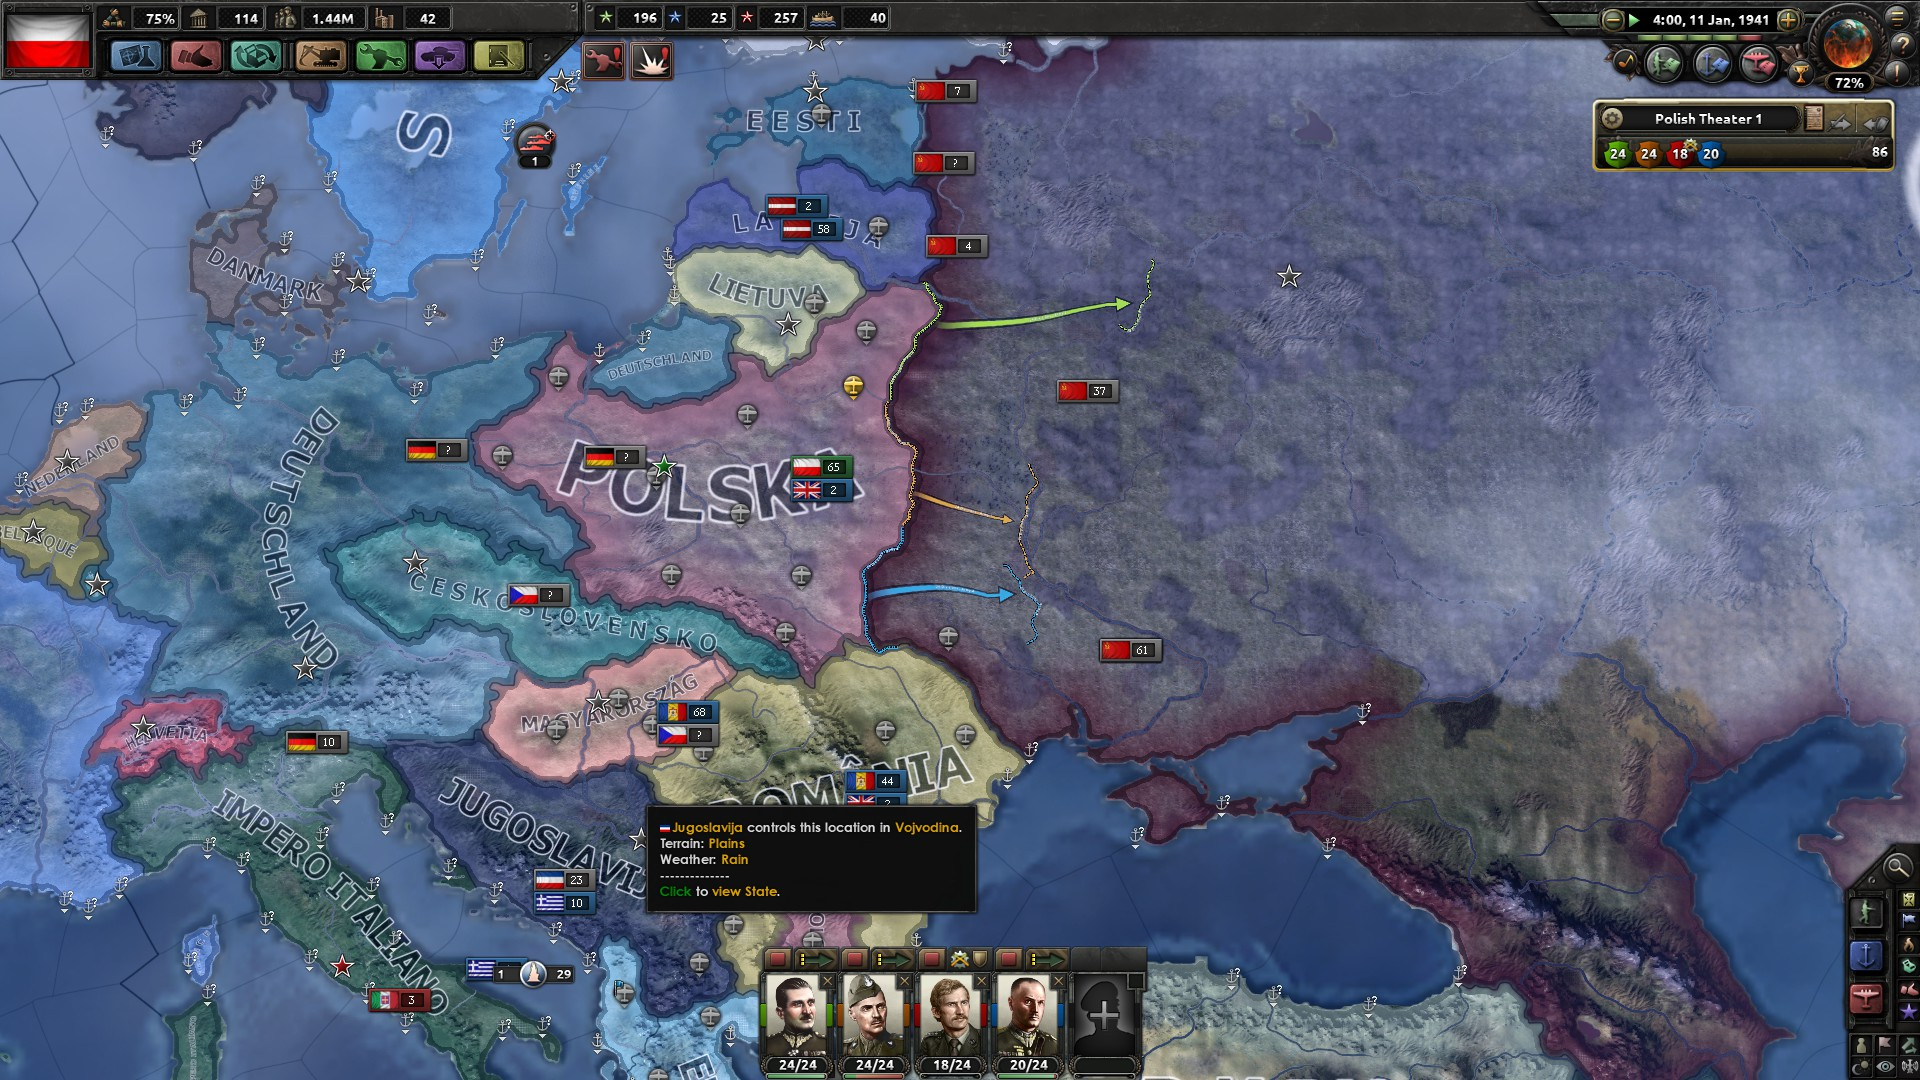 Polska run: Poland can into space, survive as Międzymorze